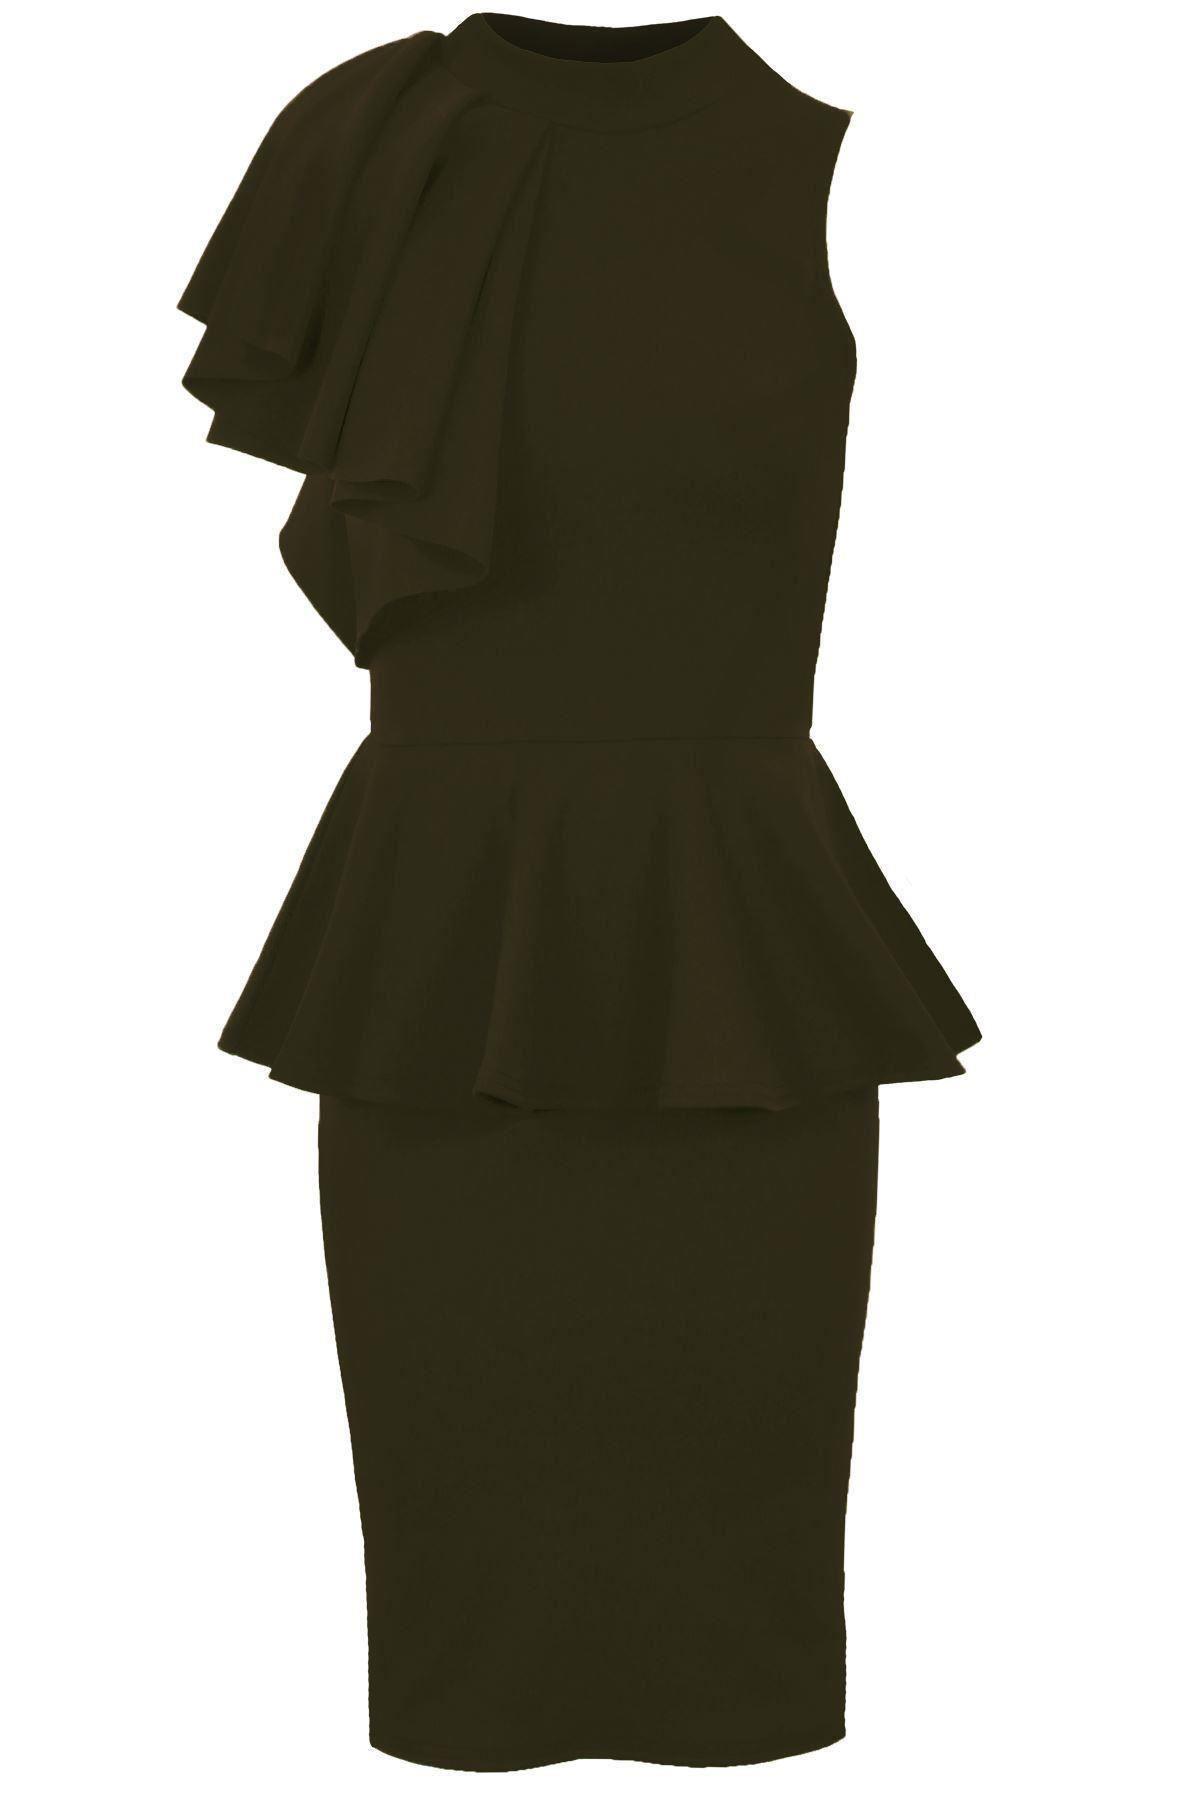 Women Ladies Sleeveless Frill Ruffle Shoulder Turtle Neck Party Peplum Dress